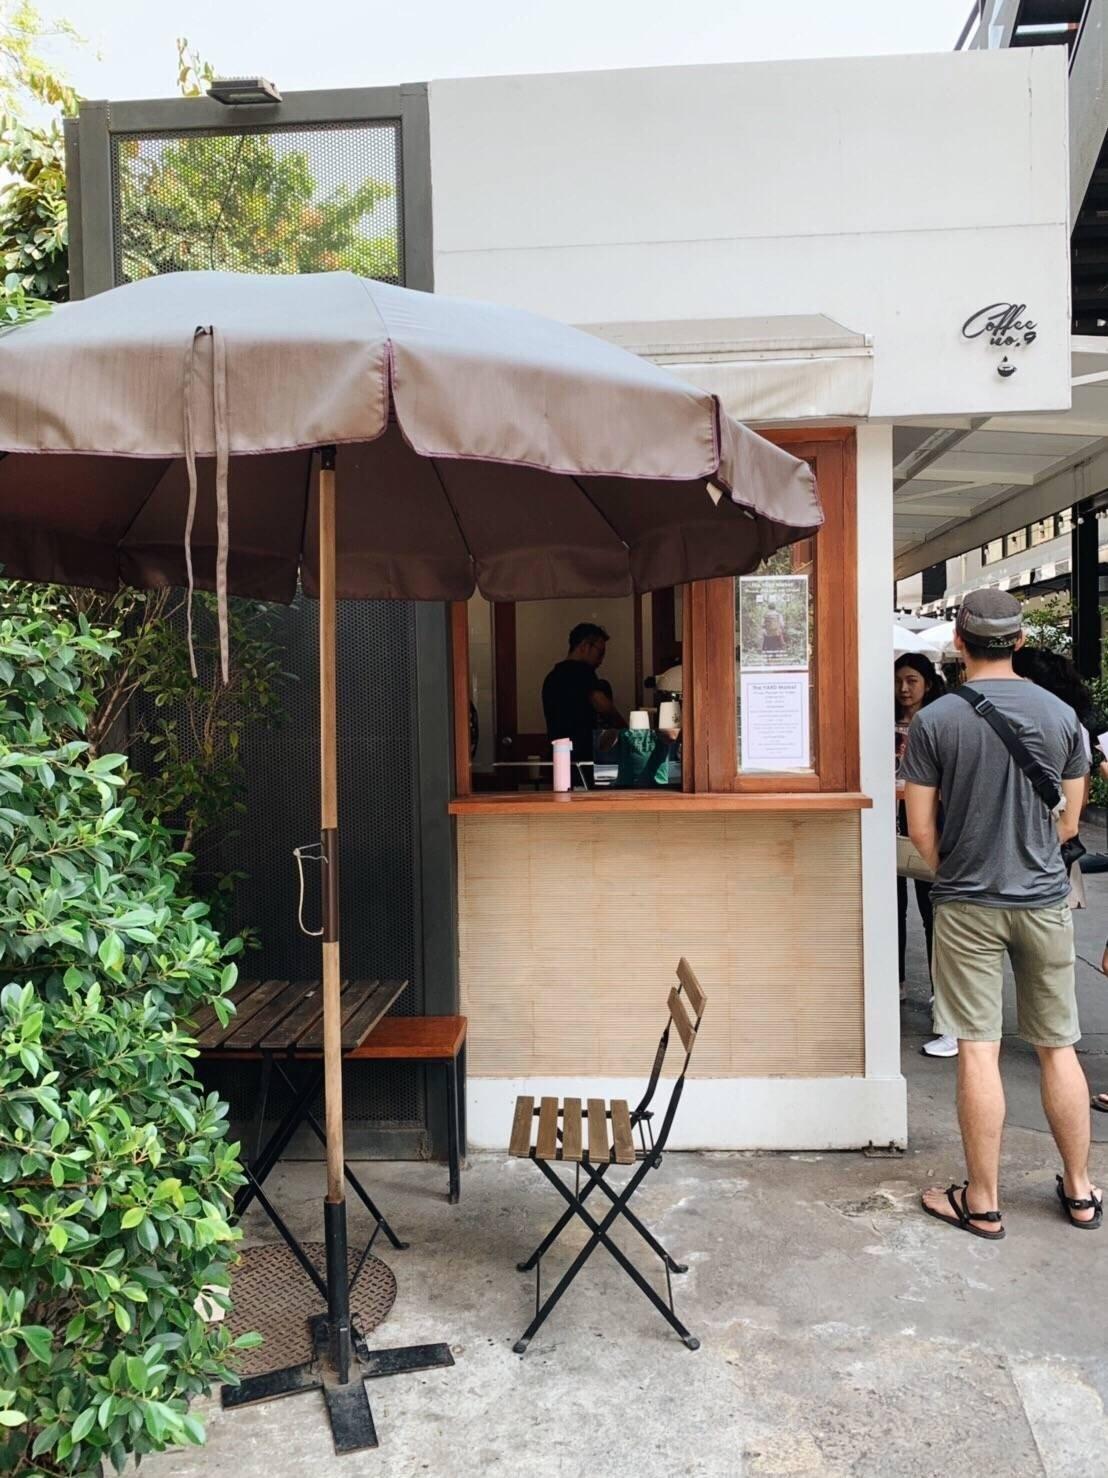 Coffee No.9 A - ONE Ari สาขา 2